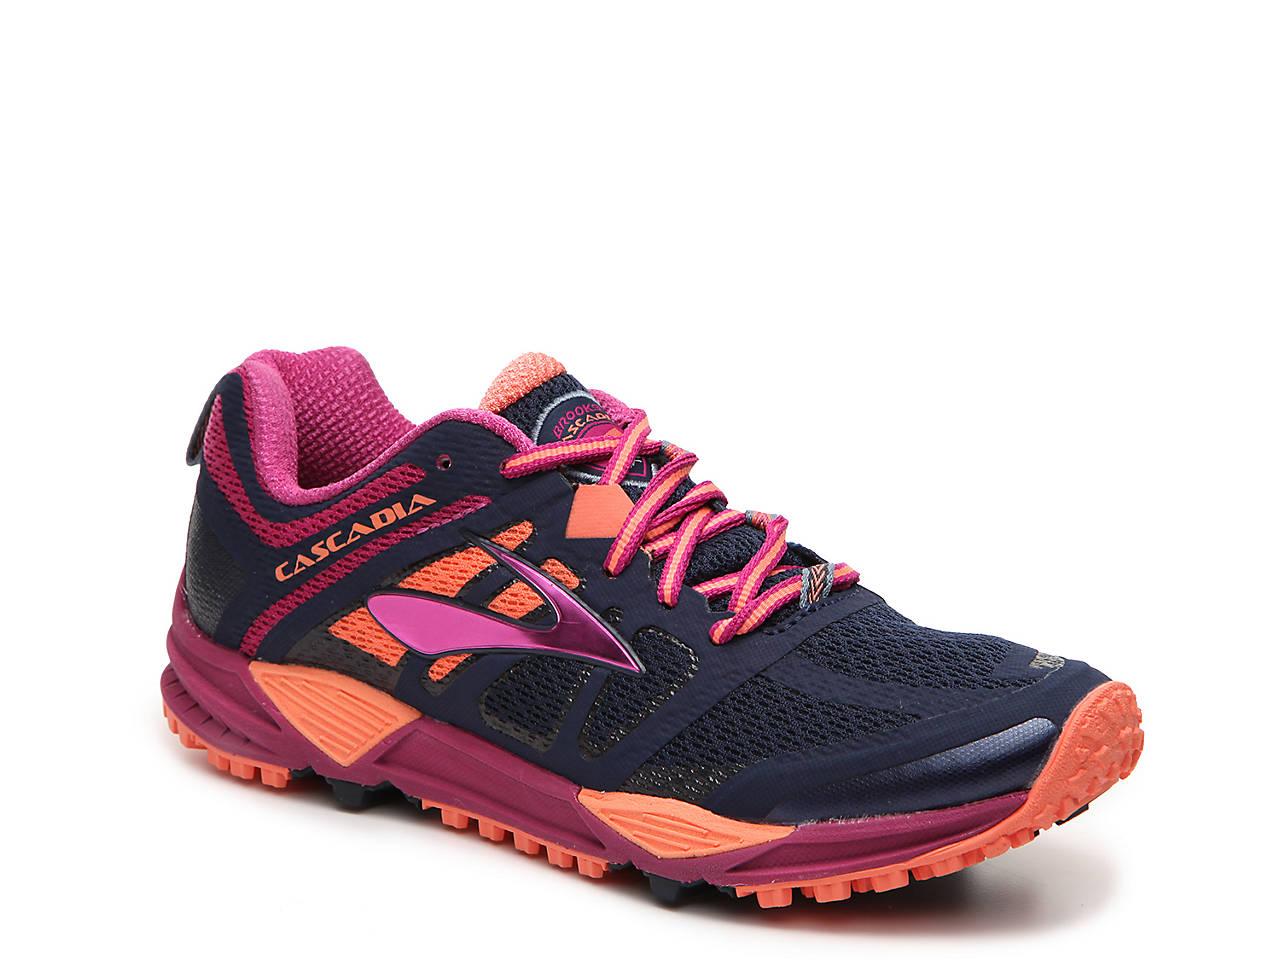 74fe4ecc0a0 Brooks Cascadia 11 Performance Trail Running Shoe - Women s Women s ...